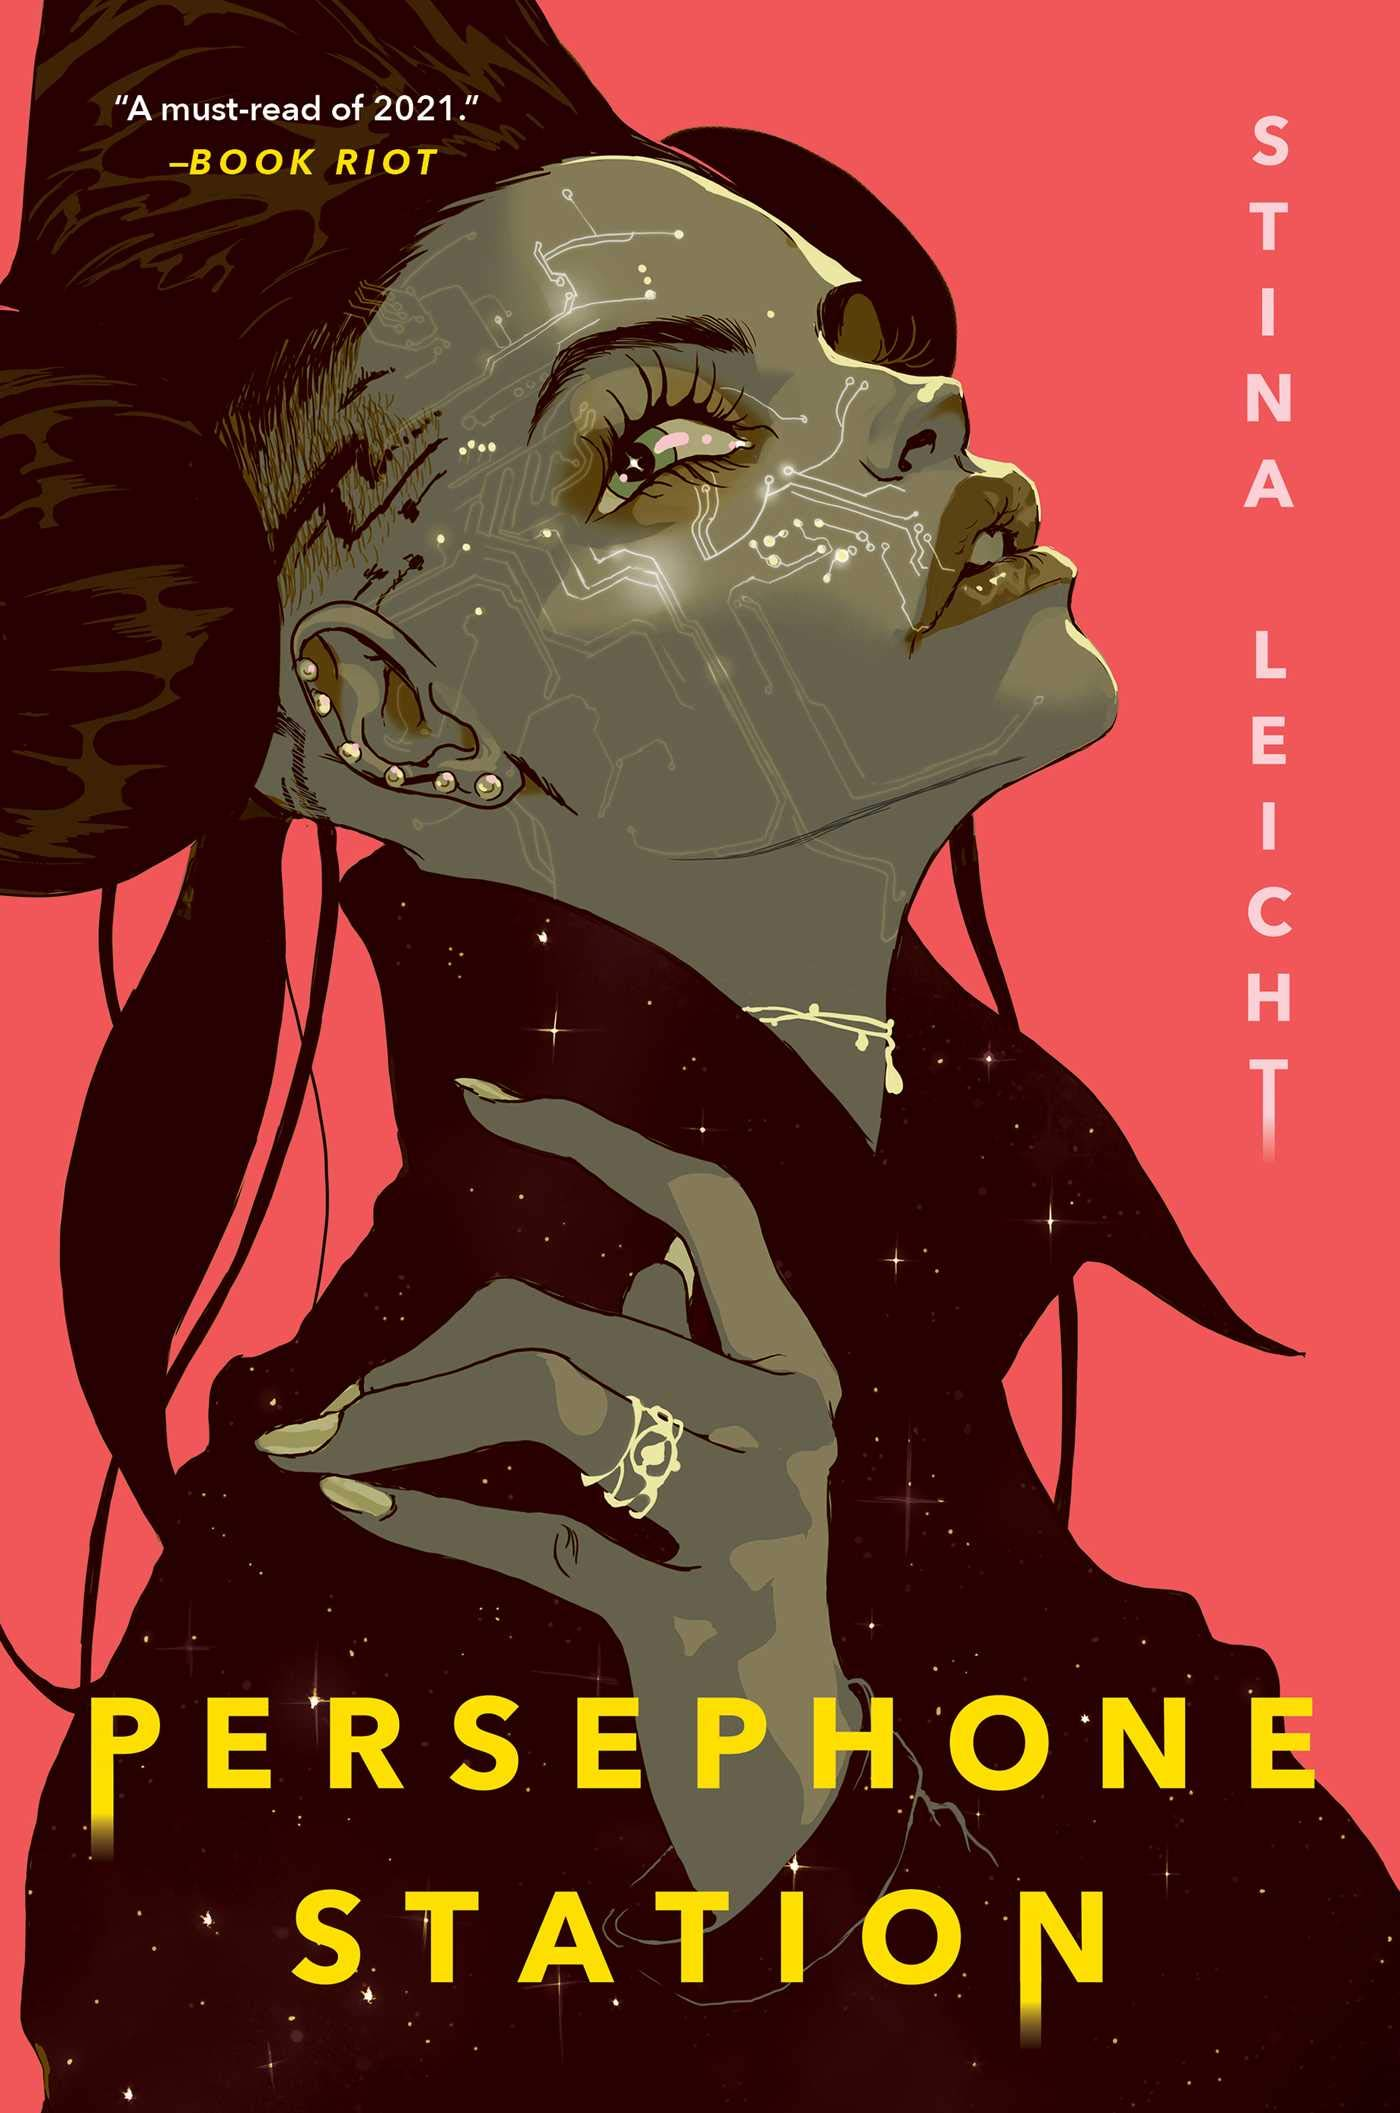 Amazon.com: Persephone Station (9781534414587): Leicht, Stina: Books